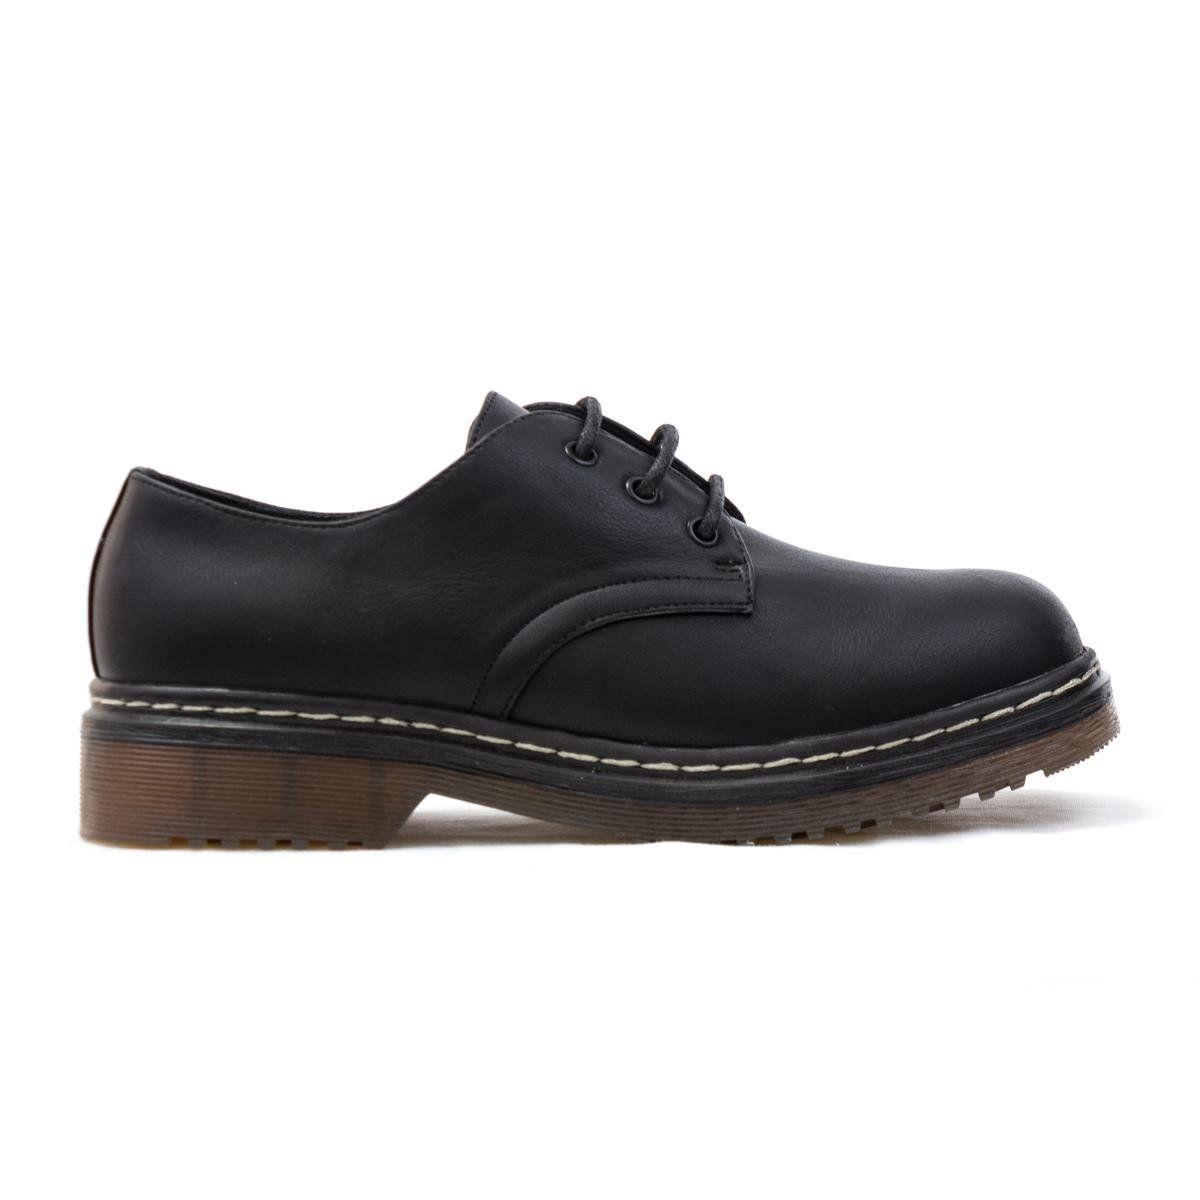 faac6a19b0e83 Lilley Womens Black Matte Lace-Up Shoe - Size 5 - Black  Amazon.co ...